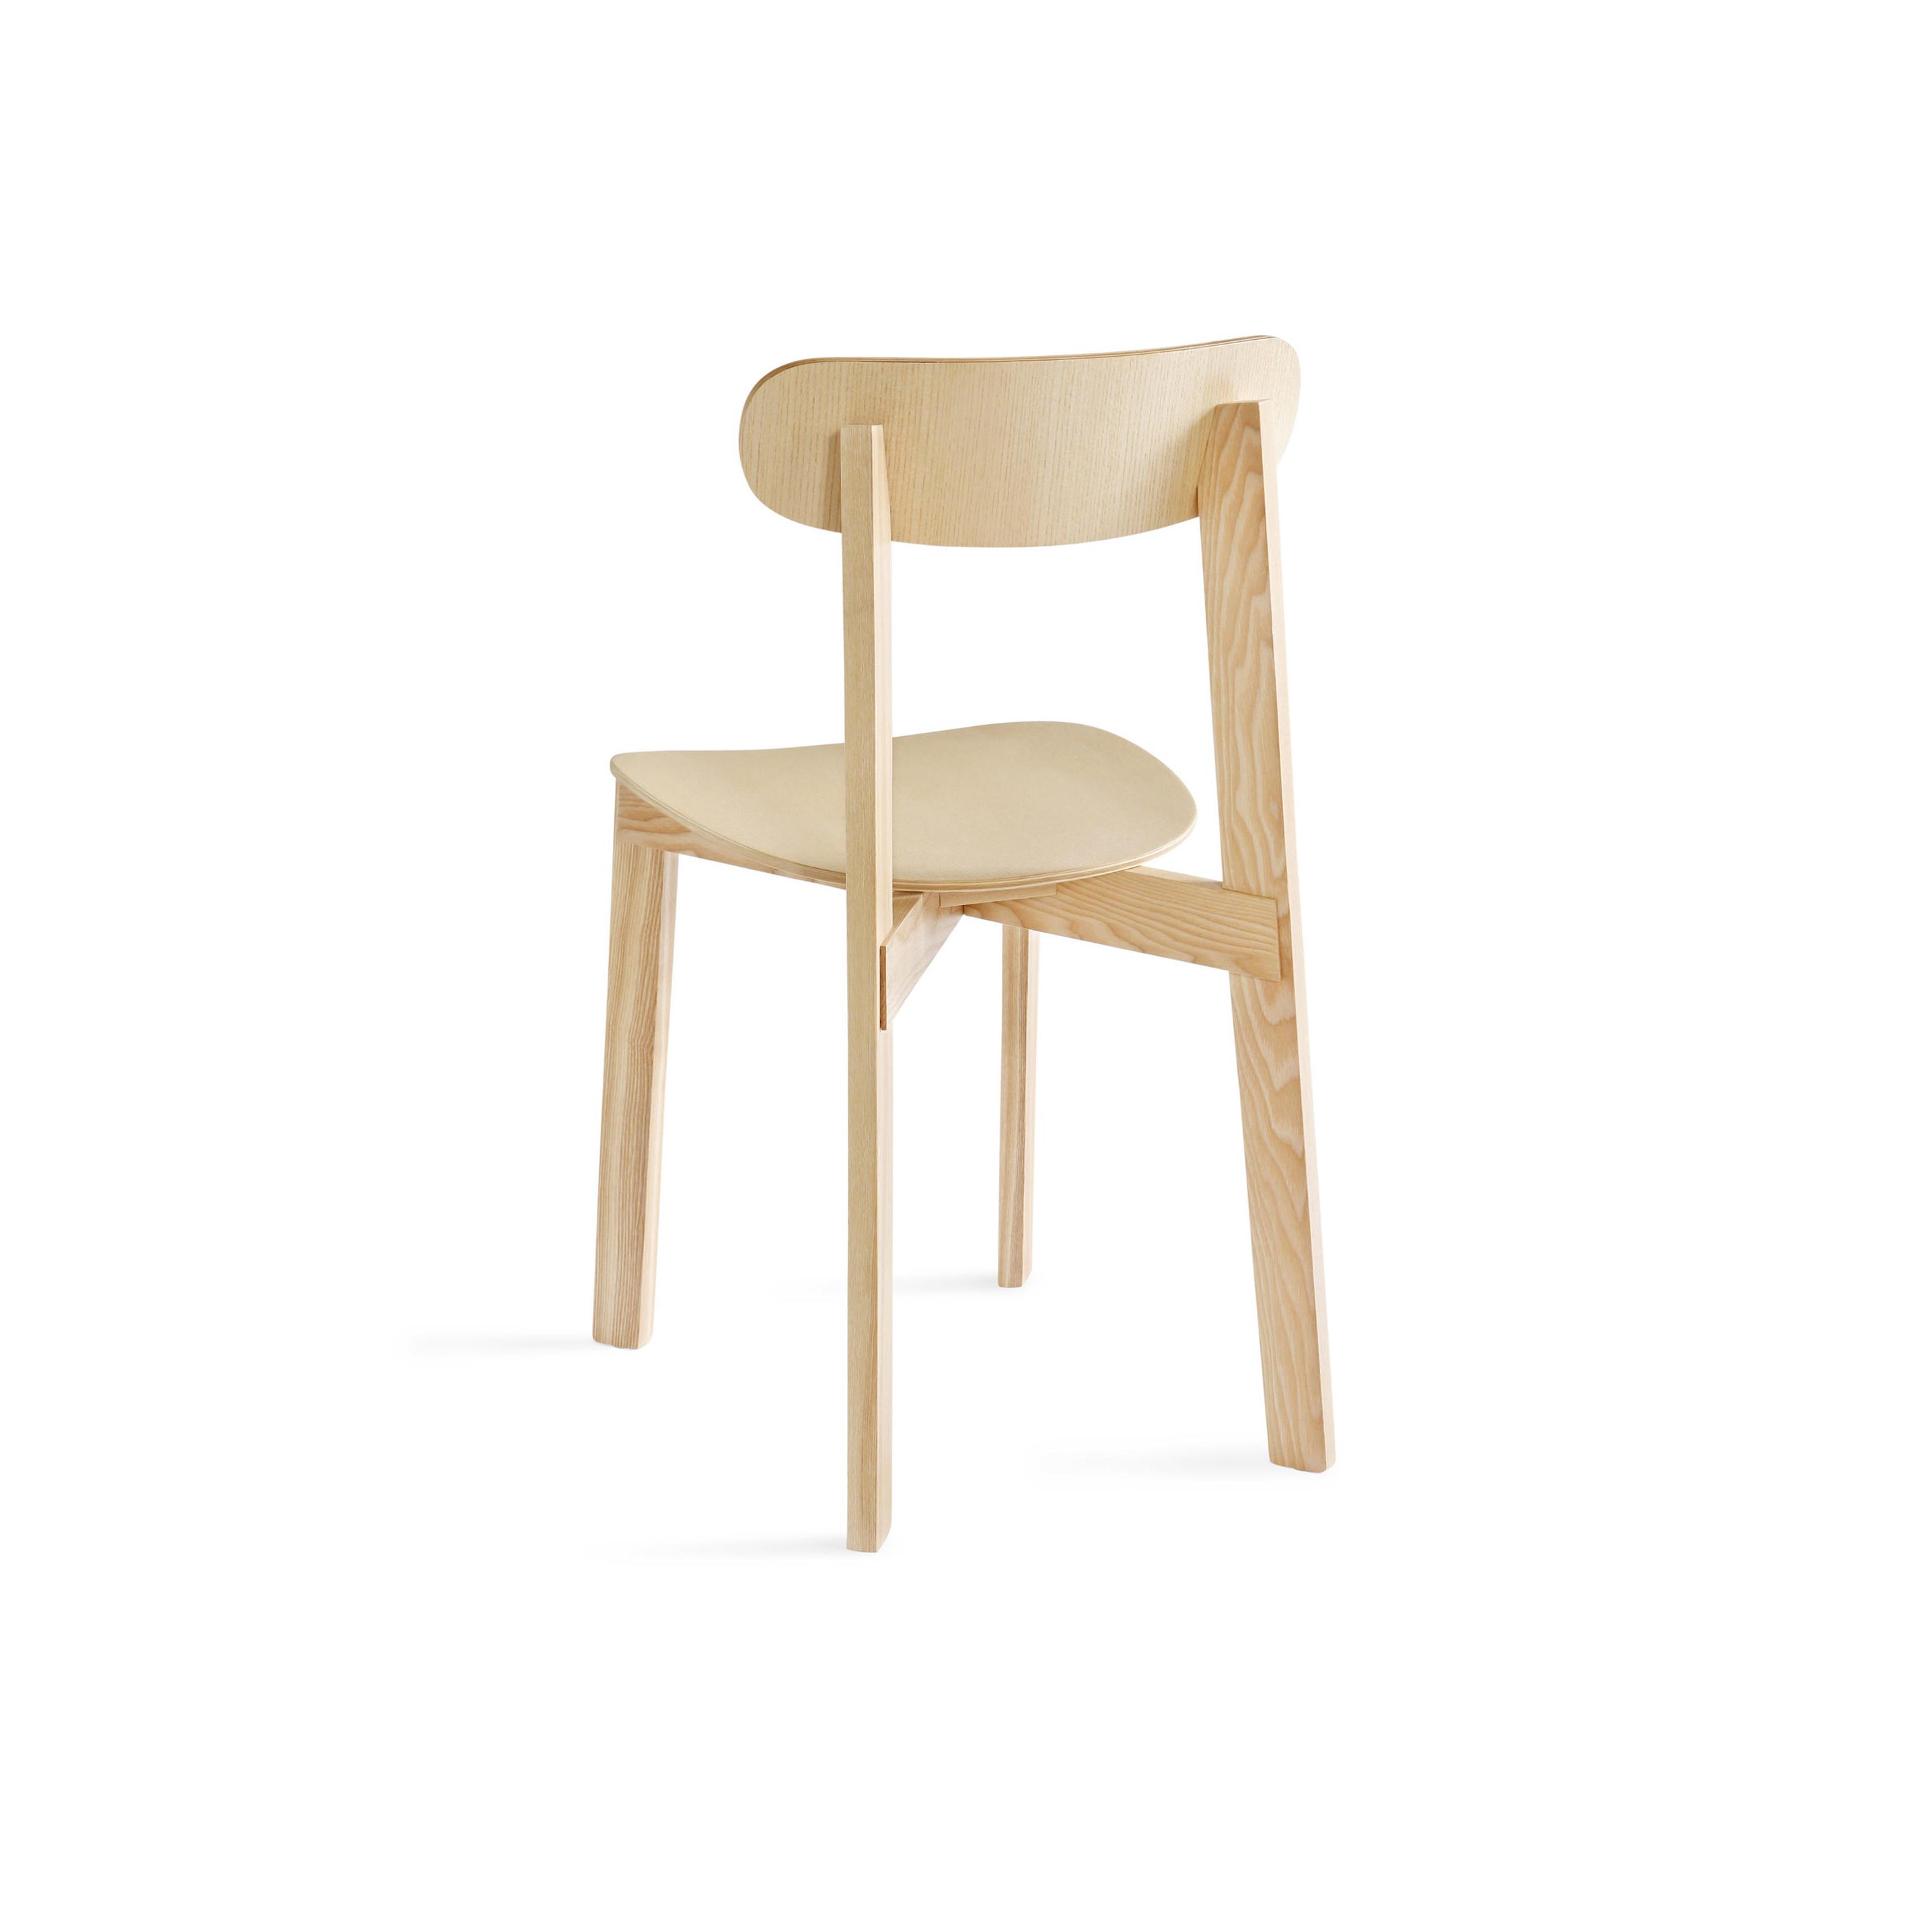 PWTBS Bondi chair